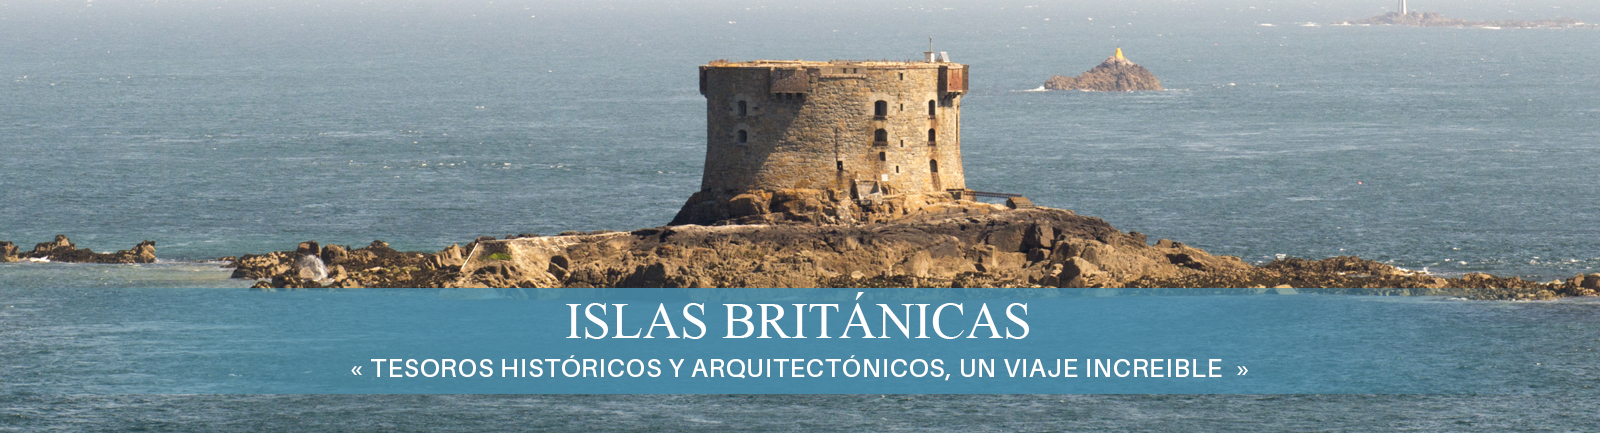 Destino Islas Británicas